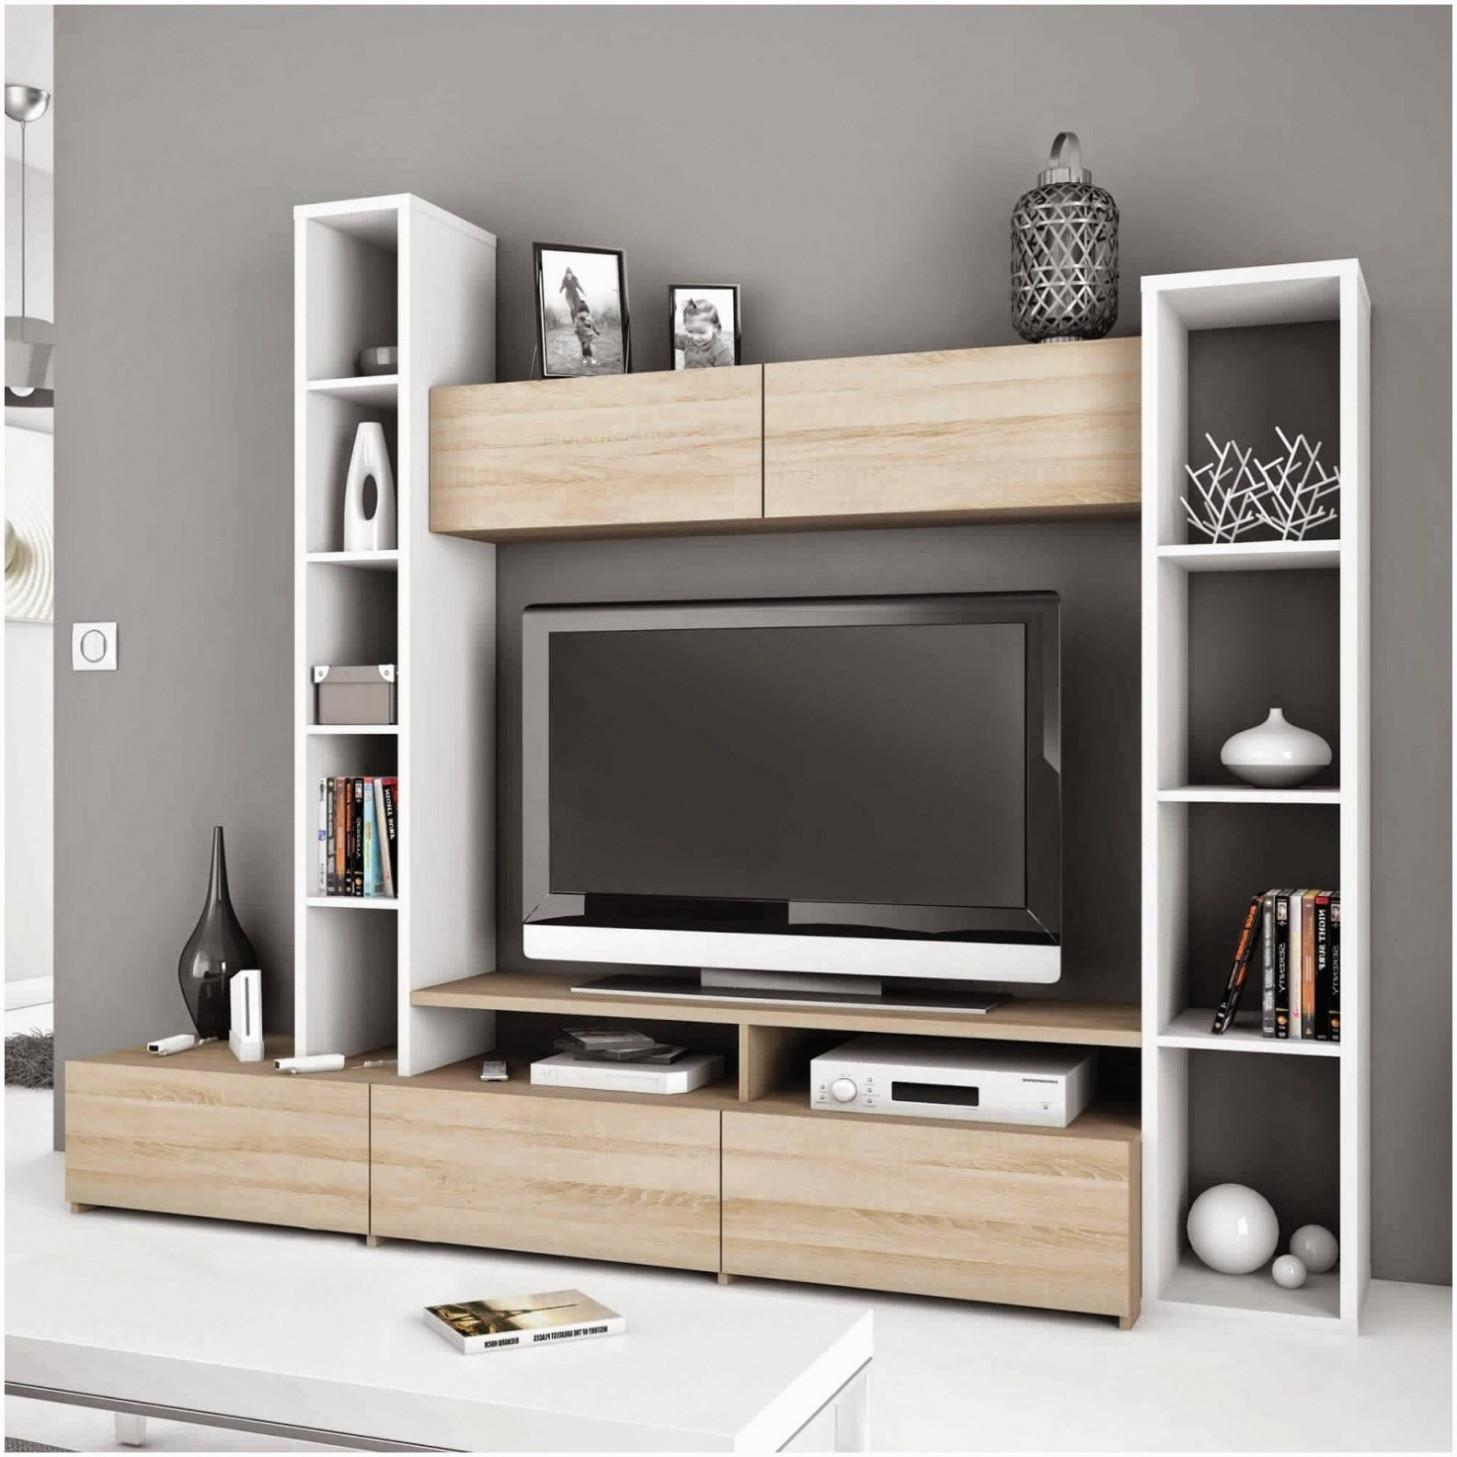 meuble tele suspendu meuble tv avec tiroir meuble tv avec etagere etagere suspendu 0d of meuble tele suspendu